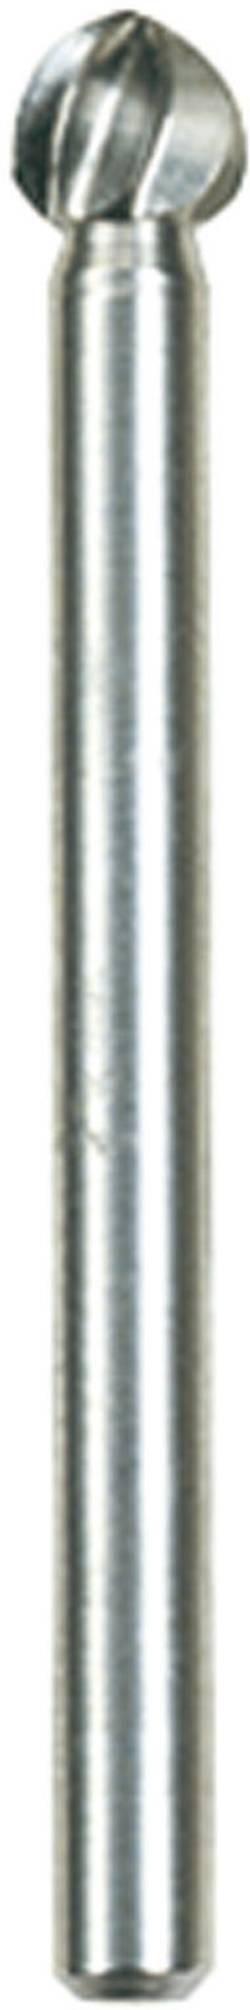 Lame-fraise à haute vitesse Ø4,8 mm Dremel 192 x2pcs